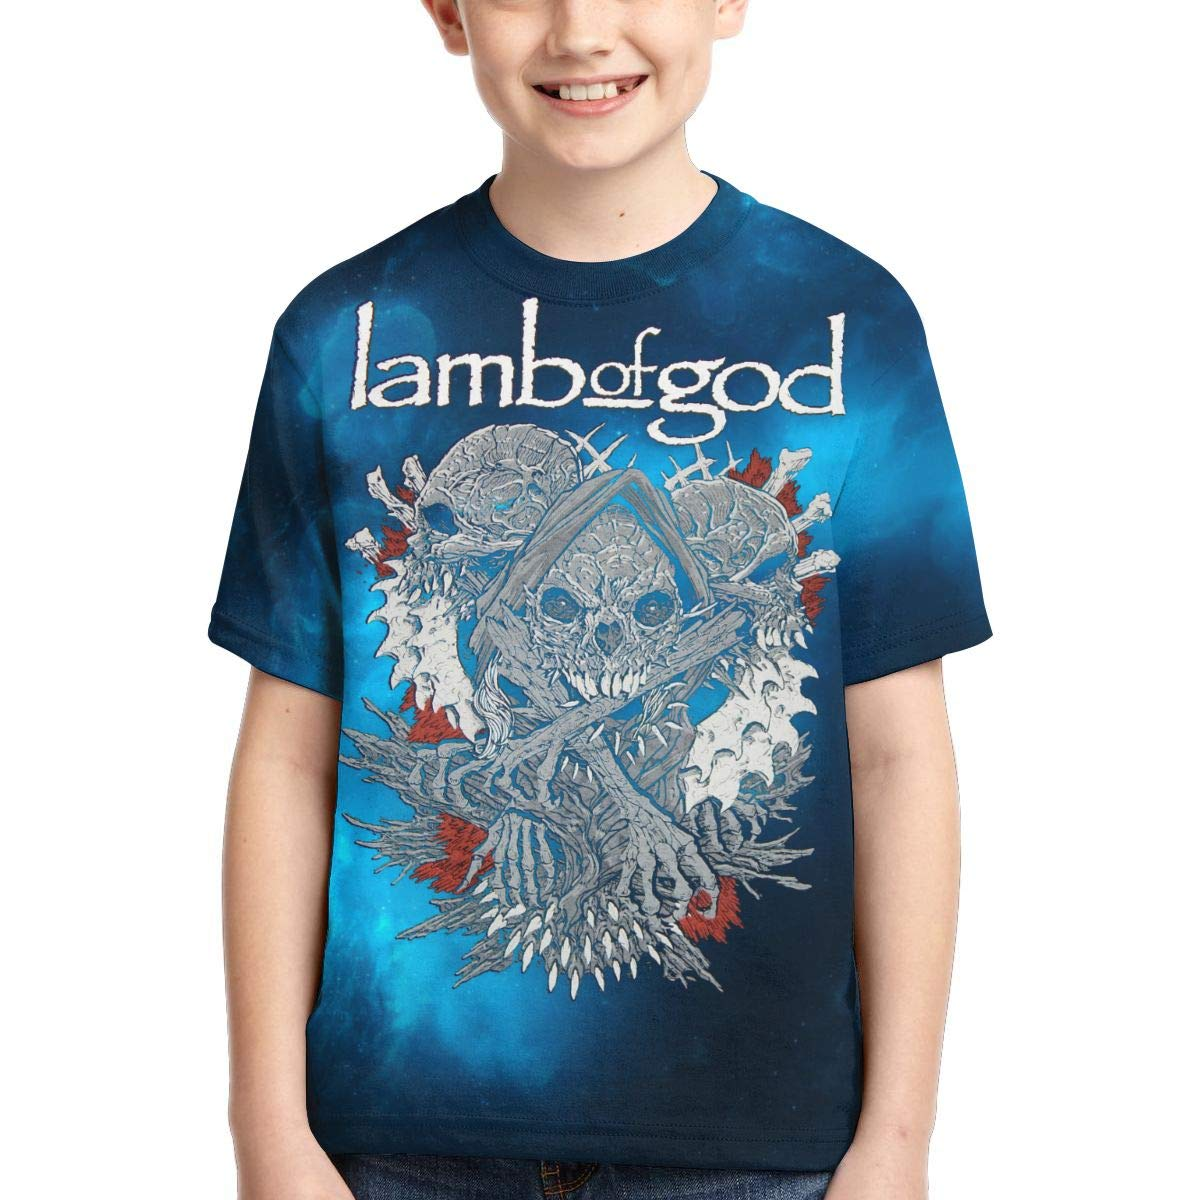 Caiyuzhuanmai Boys,Girls,Youth Lamb God T Shirts